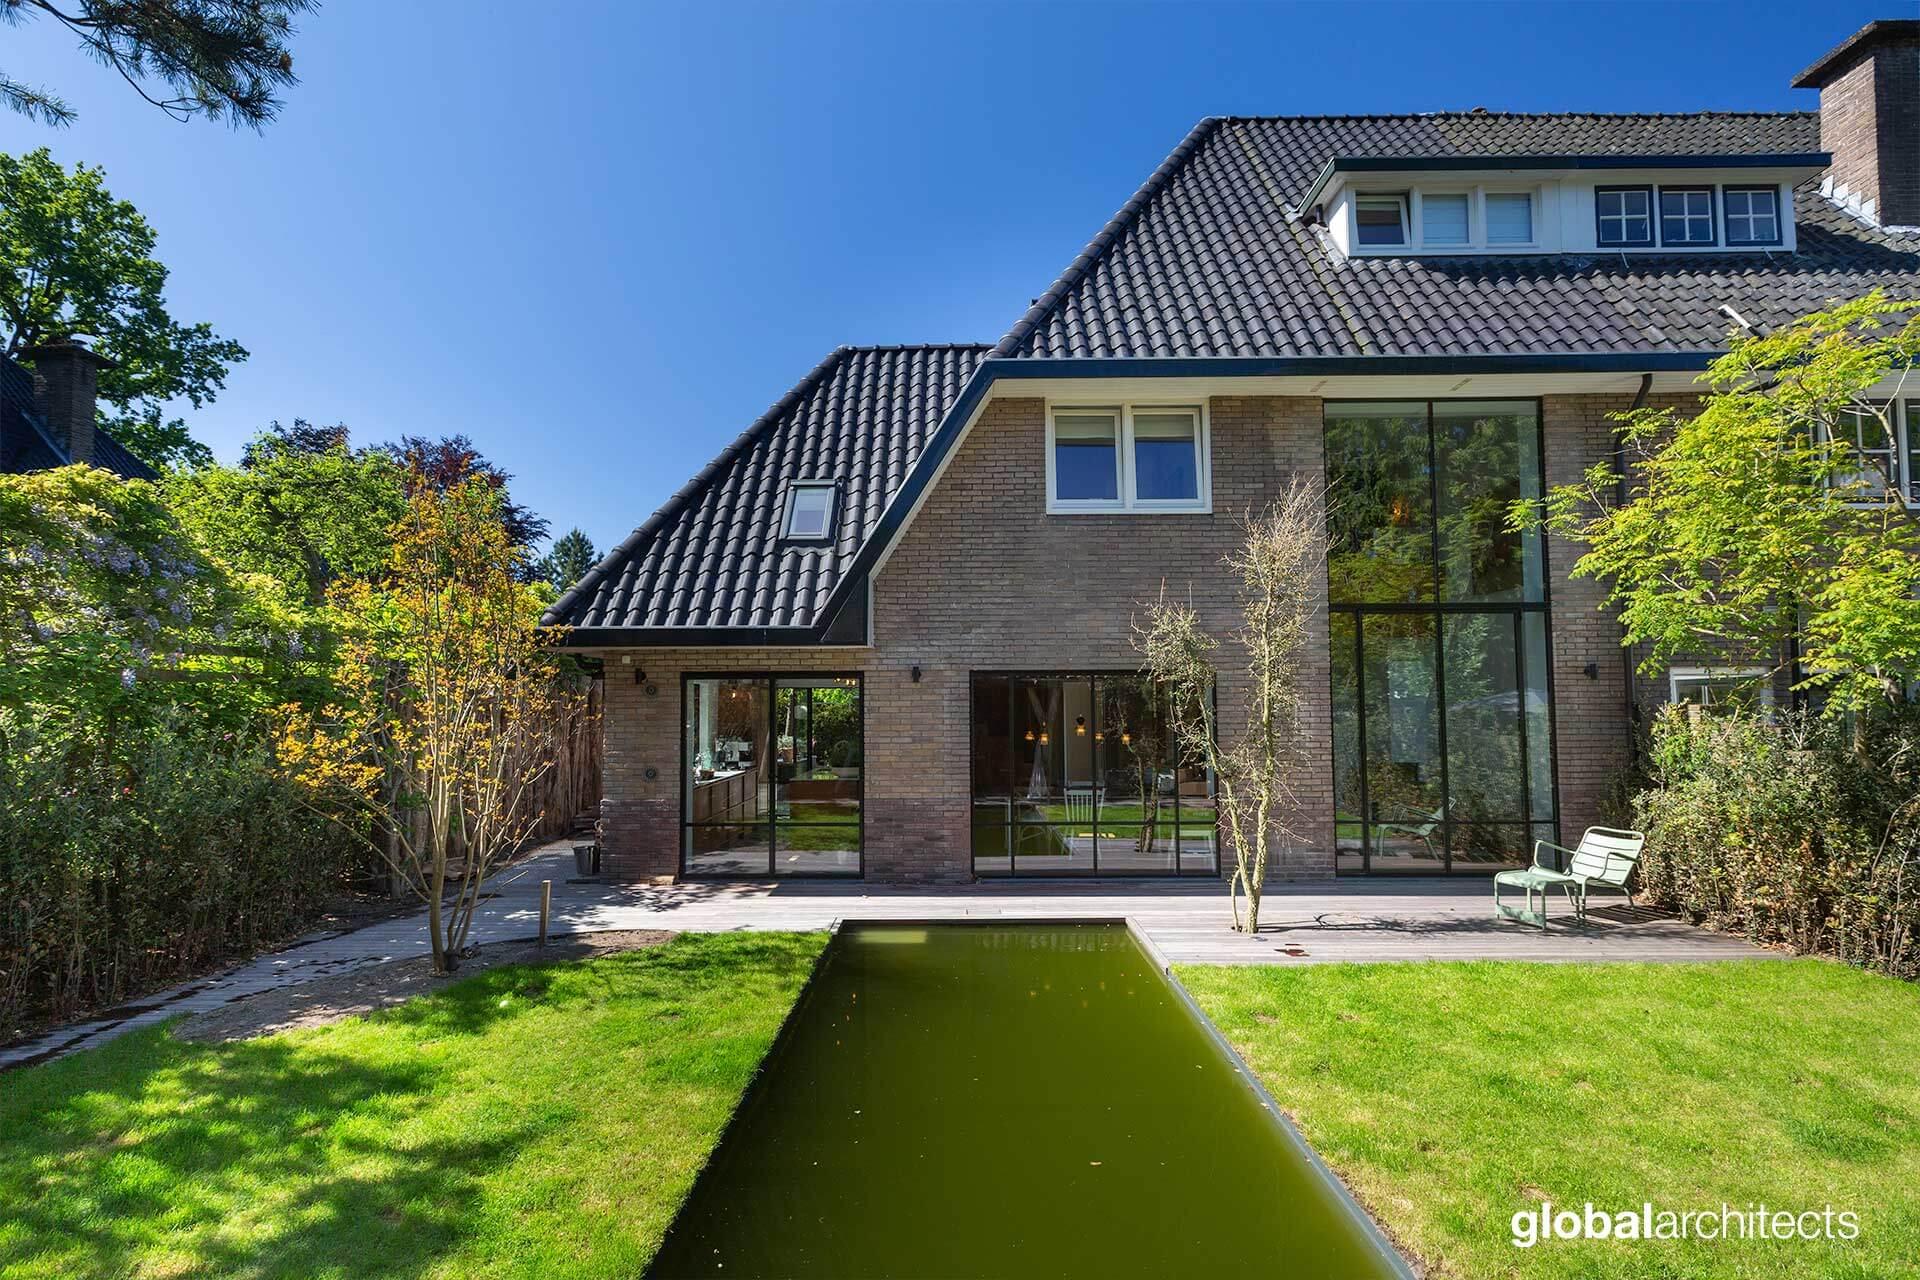 architect_Bussum_Gooi_verbouwing_renovatie_architectuur_interieurontwerp_design_013